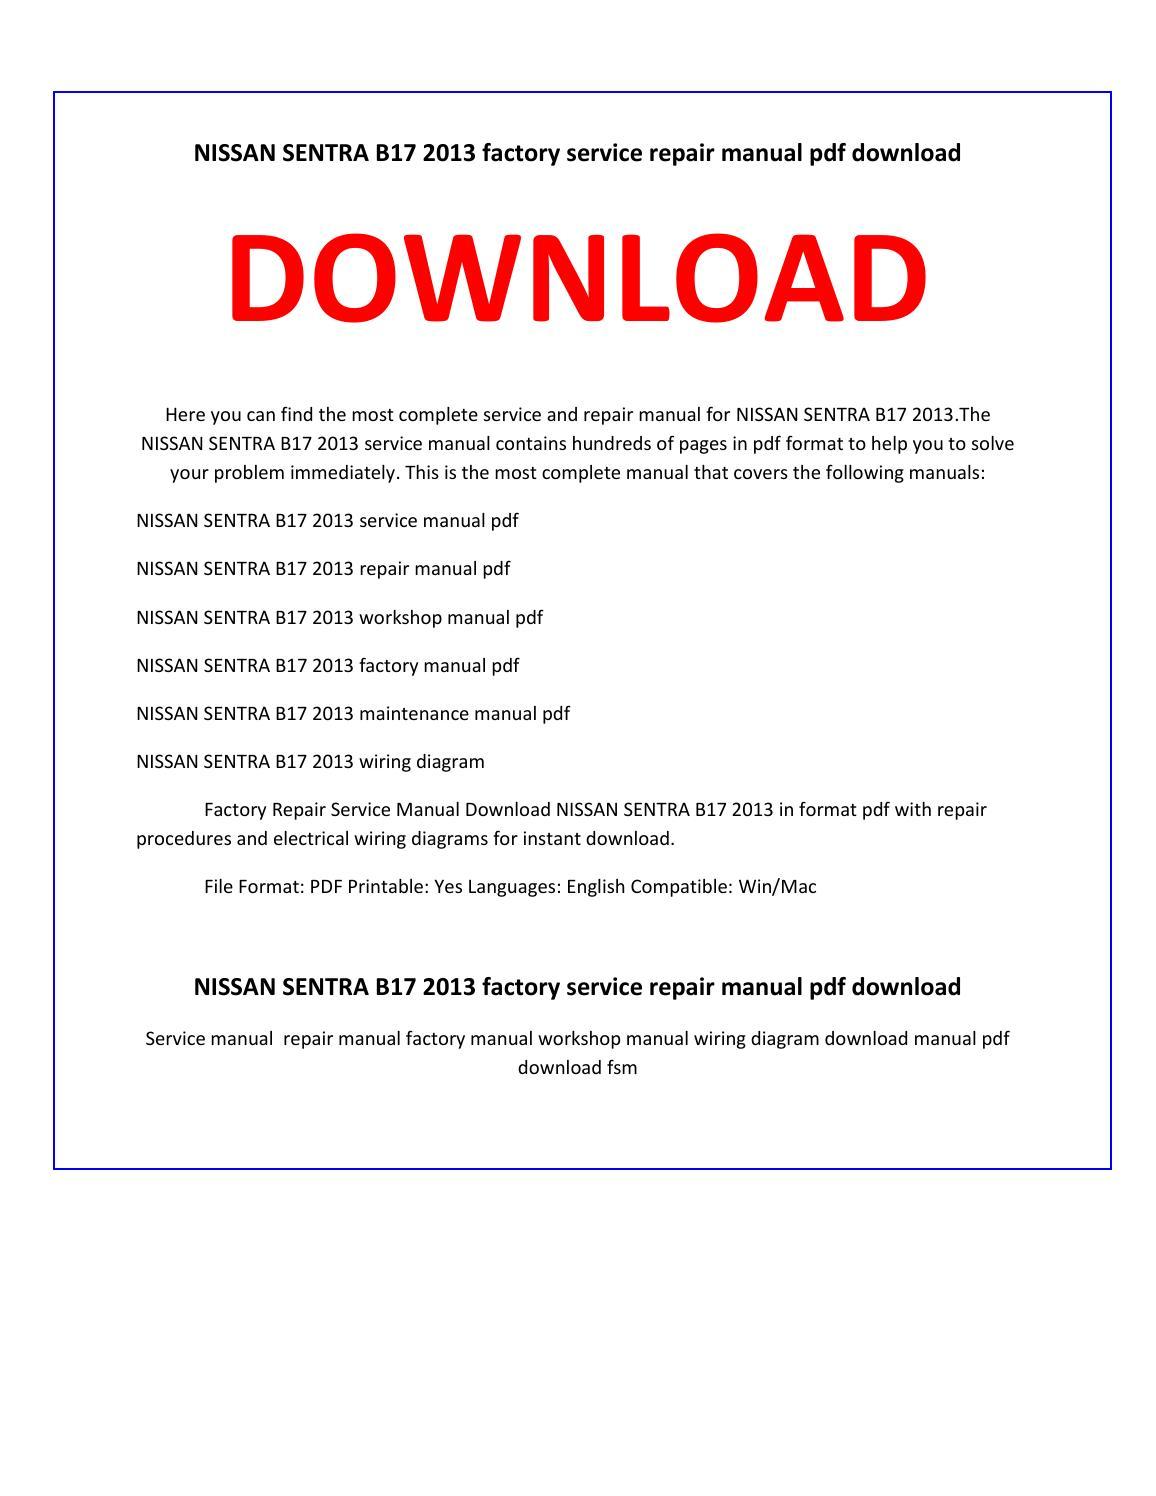 Nissan Sentra Service Manual: Wiring diagram